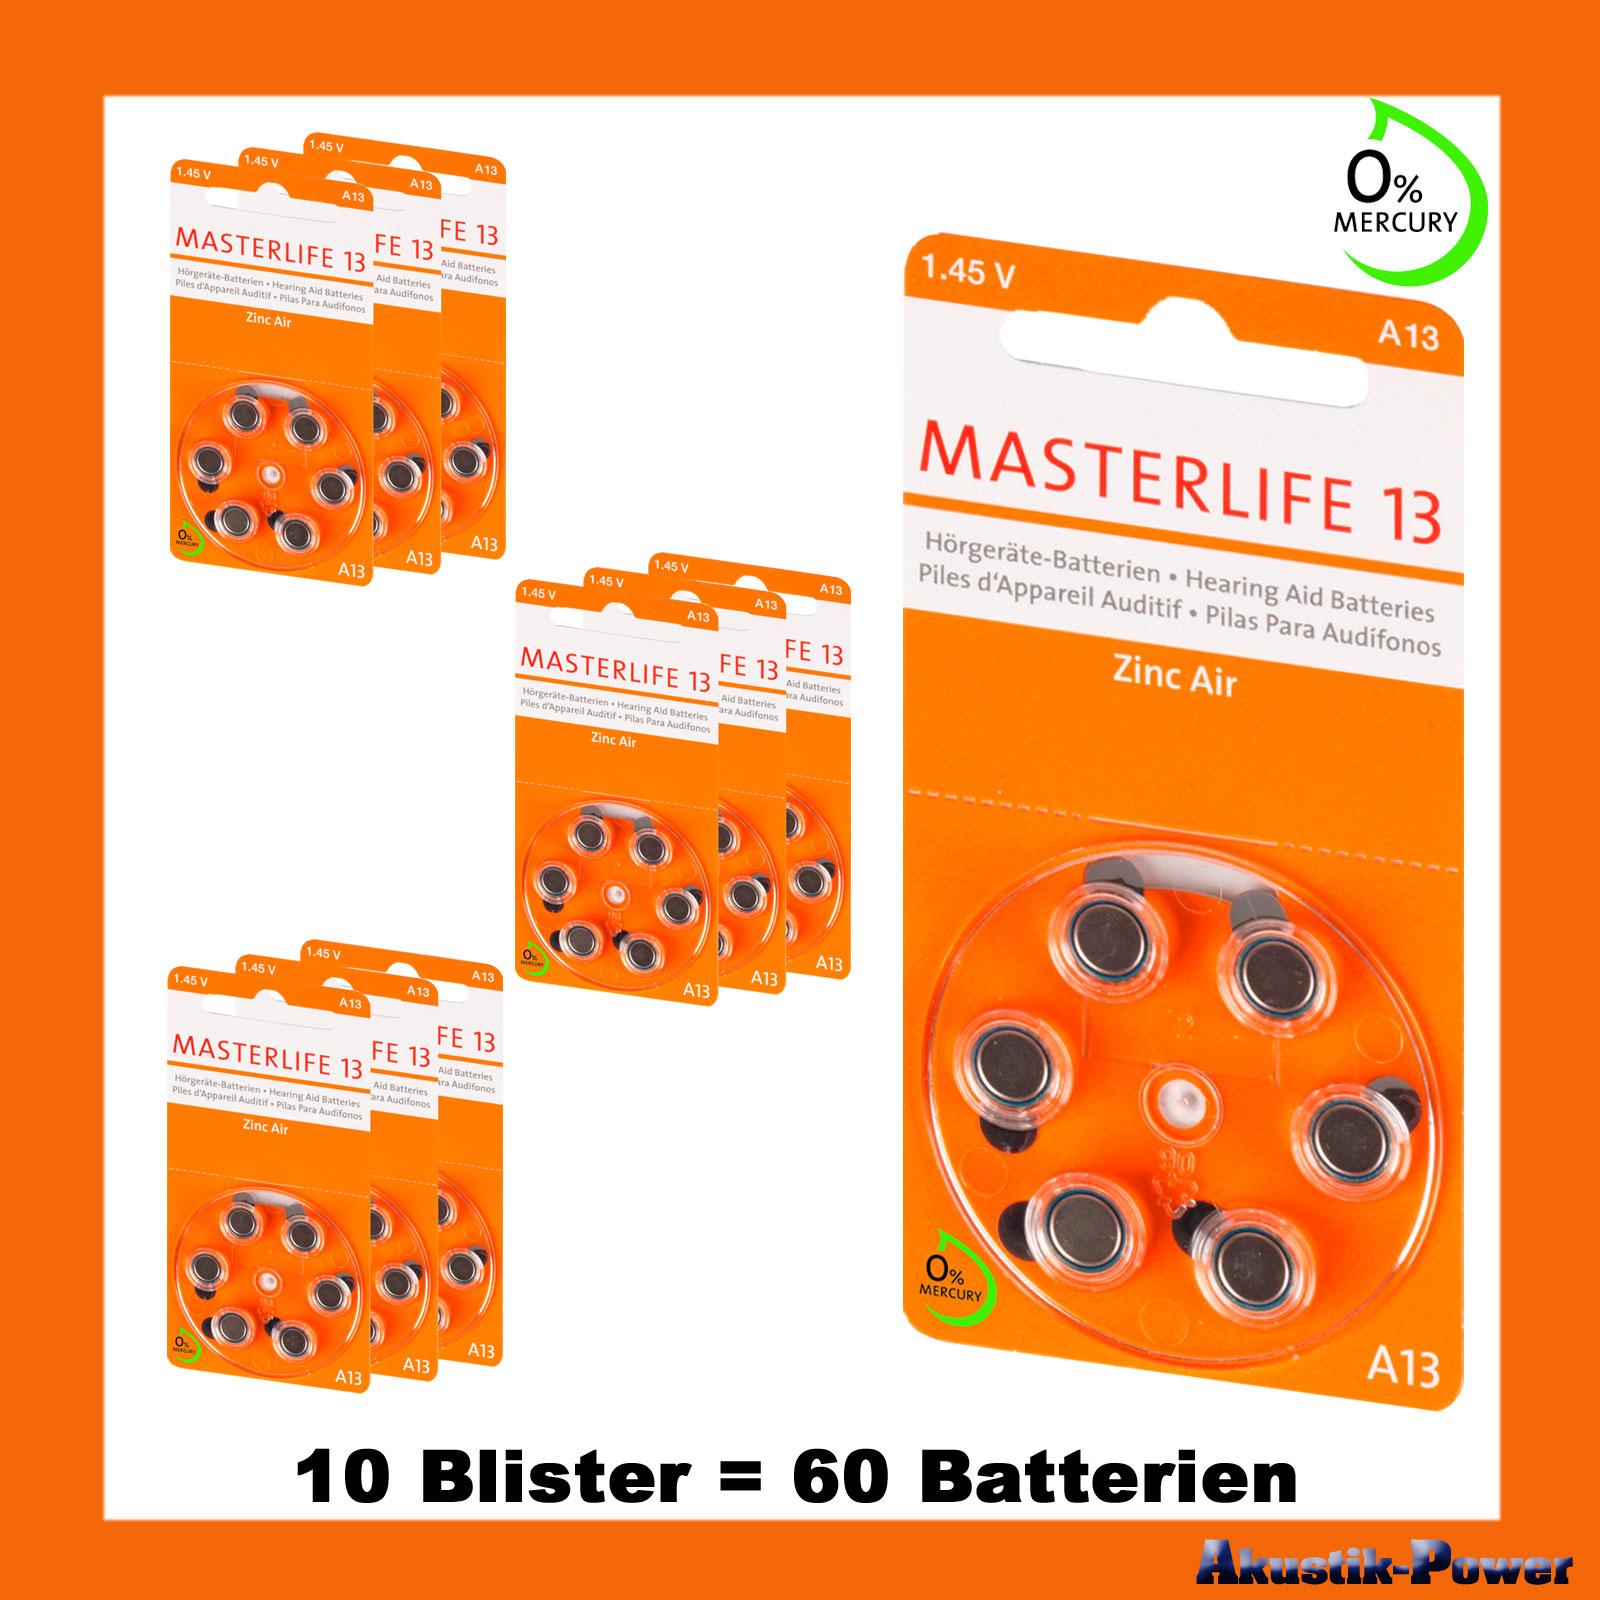 akustik power 60 st ck masterlife h rger te batterie typ 13 pr48 orange a13 mercury free. Black Bedroom Furniture Sets. Home Design Ideas